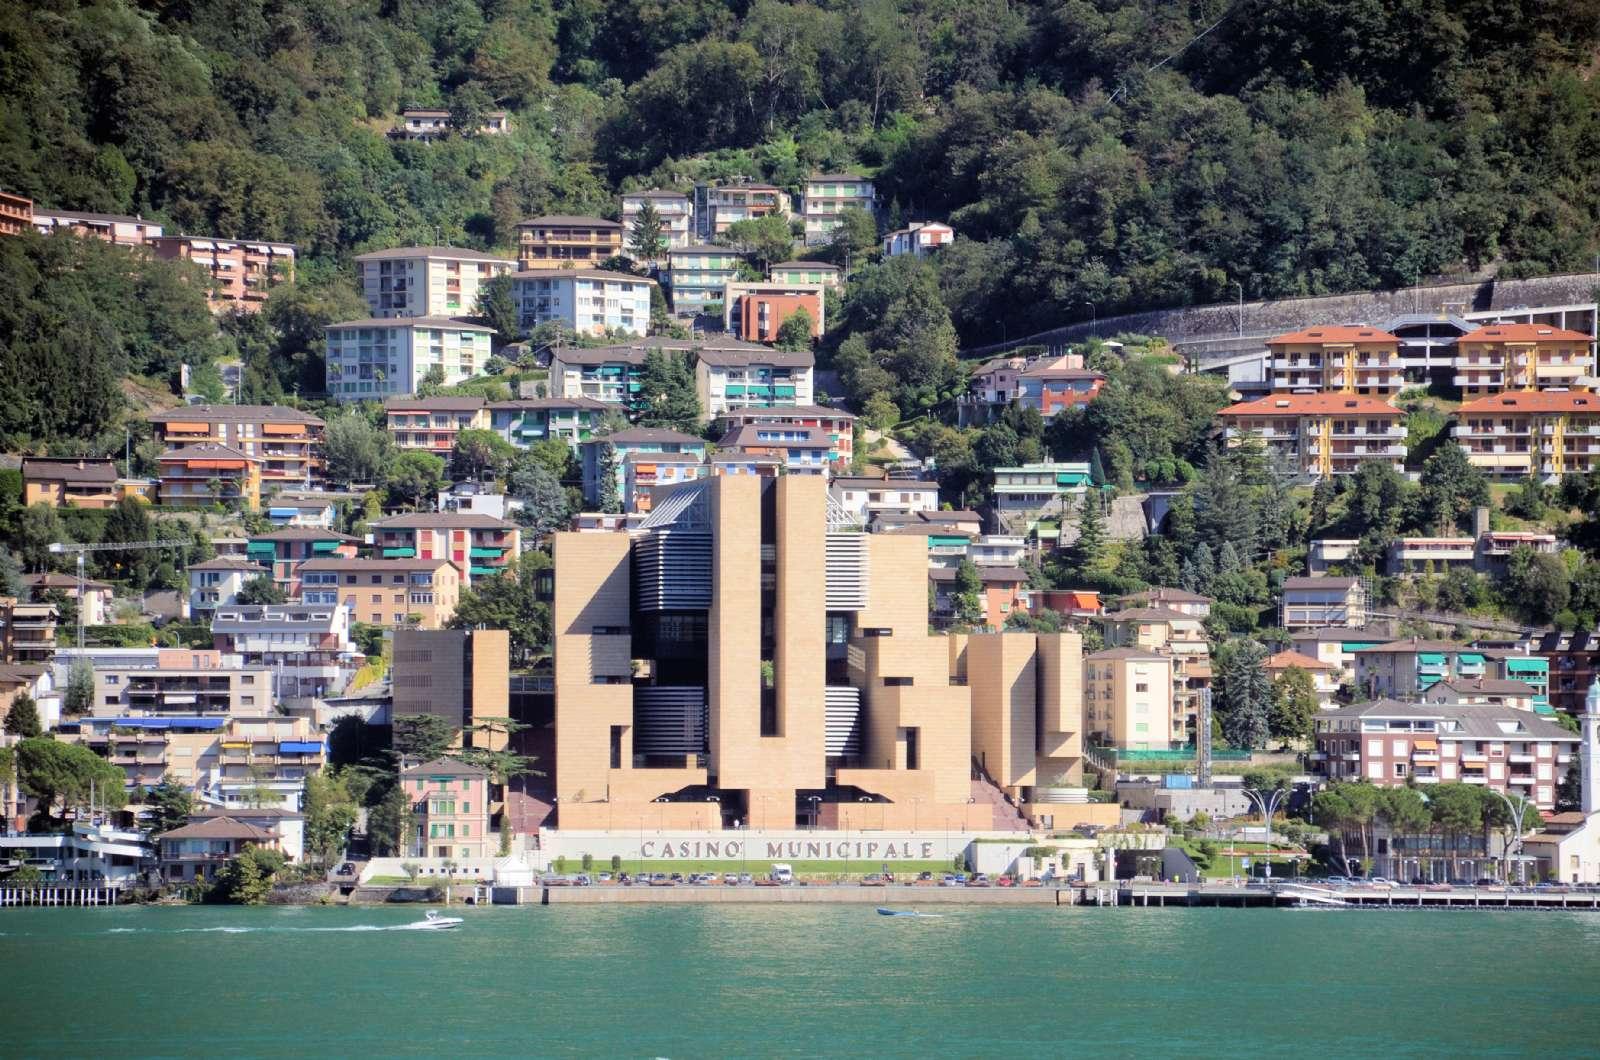 La ville italienne Campione d'Italia en Suisse